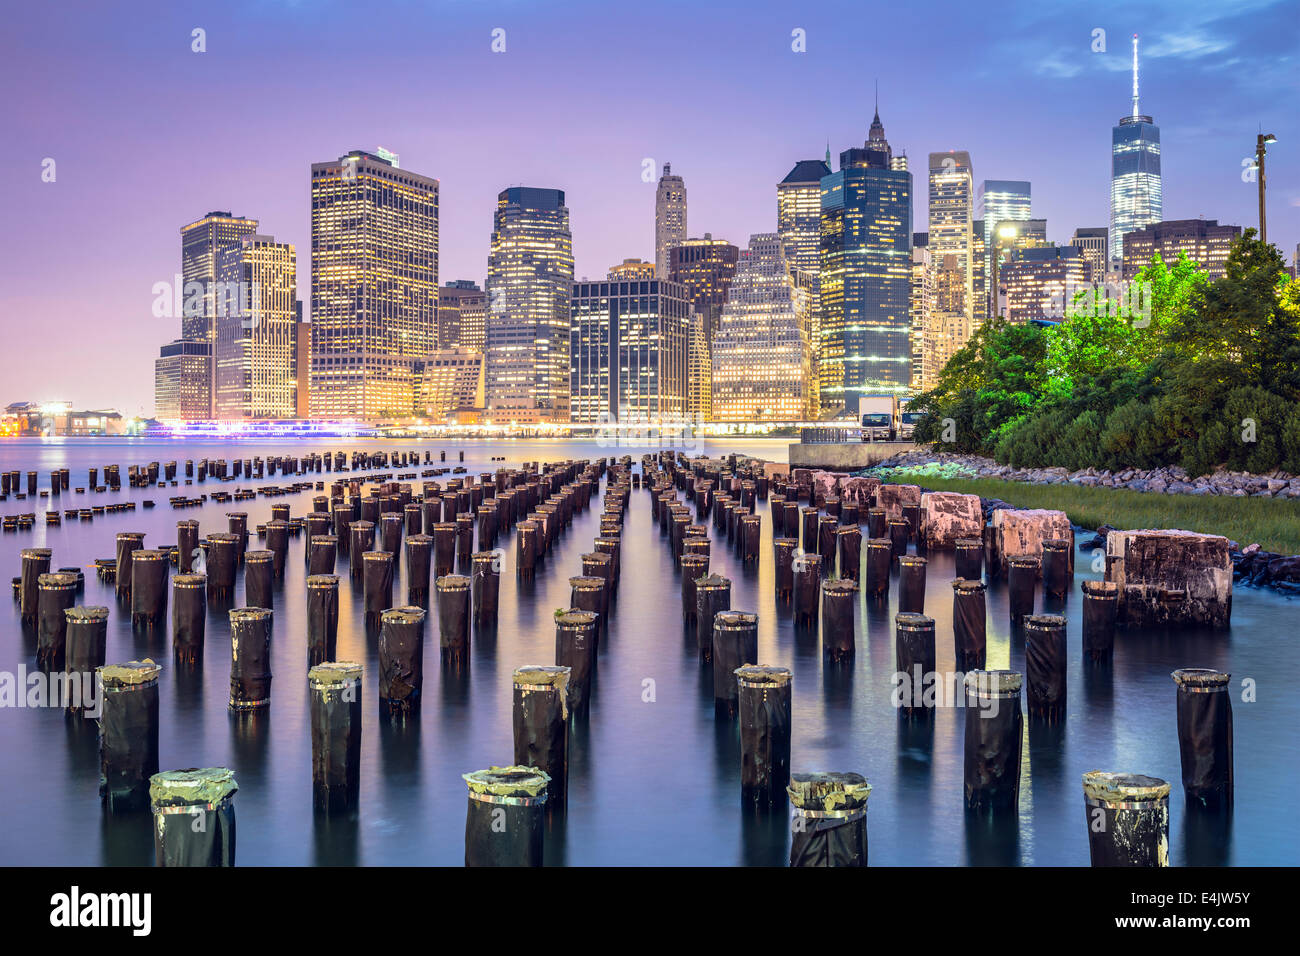 New York City, USA skyline at night. - Stock Image